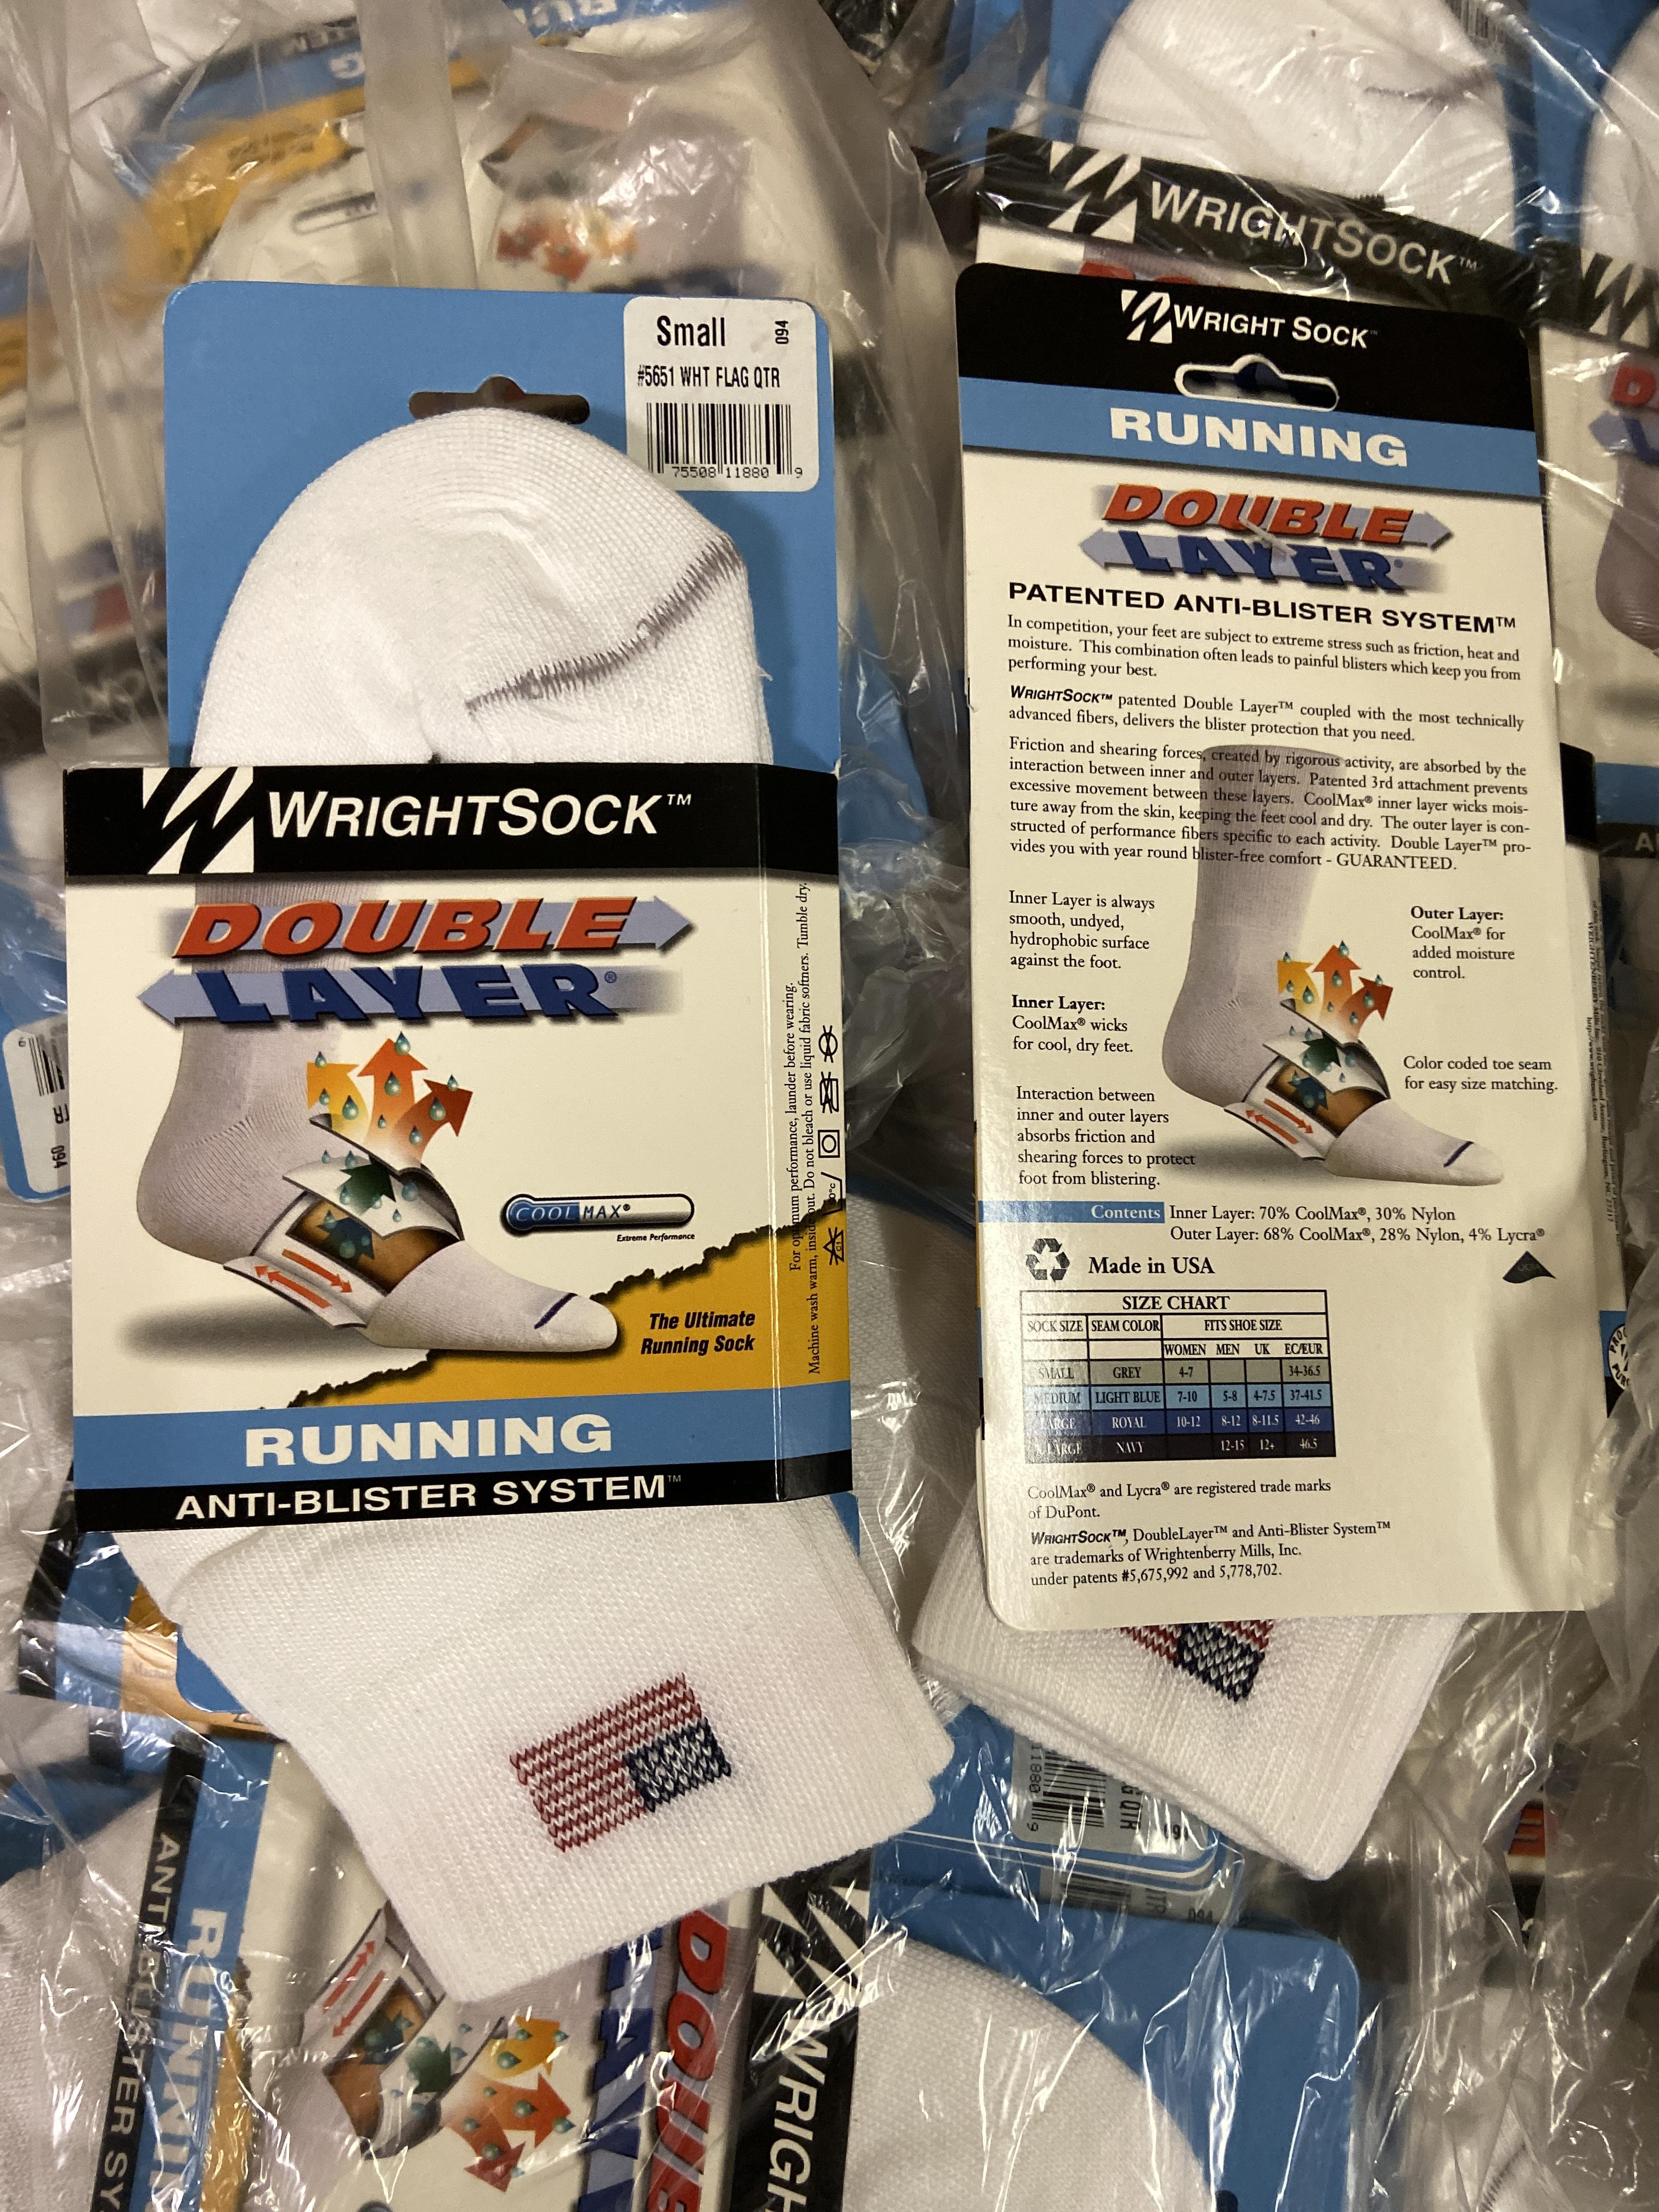 500+ packs of New Socks, Wrightsock Running, Double Layer, USA America Flag White - Image 3 of 5